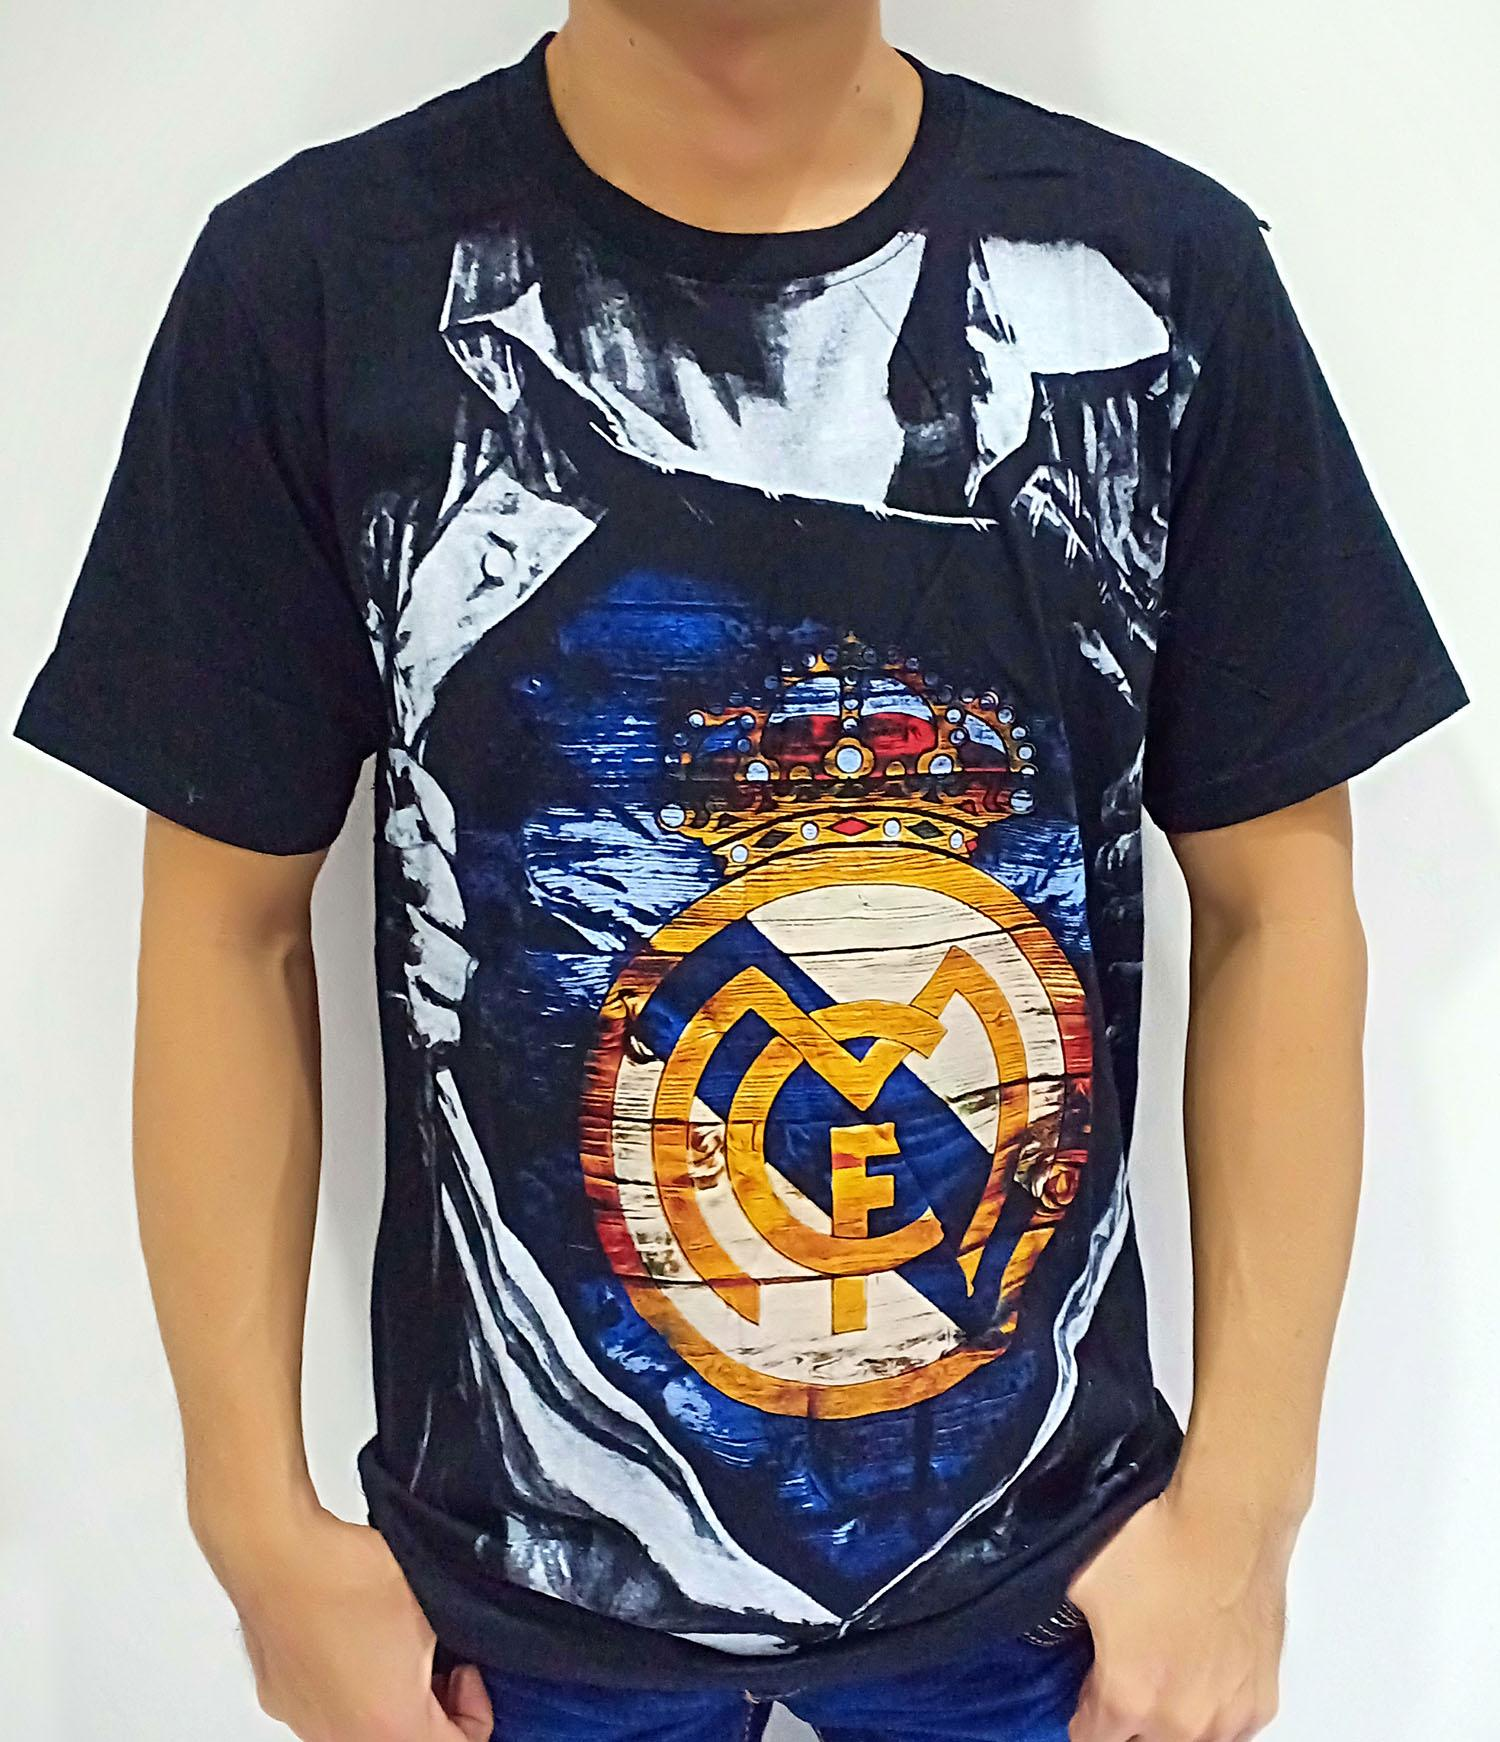 Cikitashop - Kaos T-Shirt Distro / Kaos Pria / T-Shirt Pria / Singlet Anime Premium Real Madrid